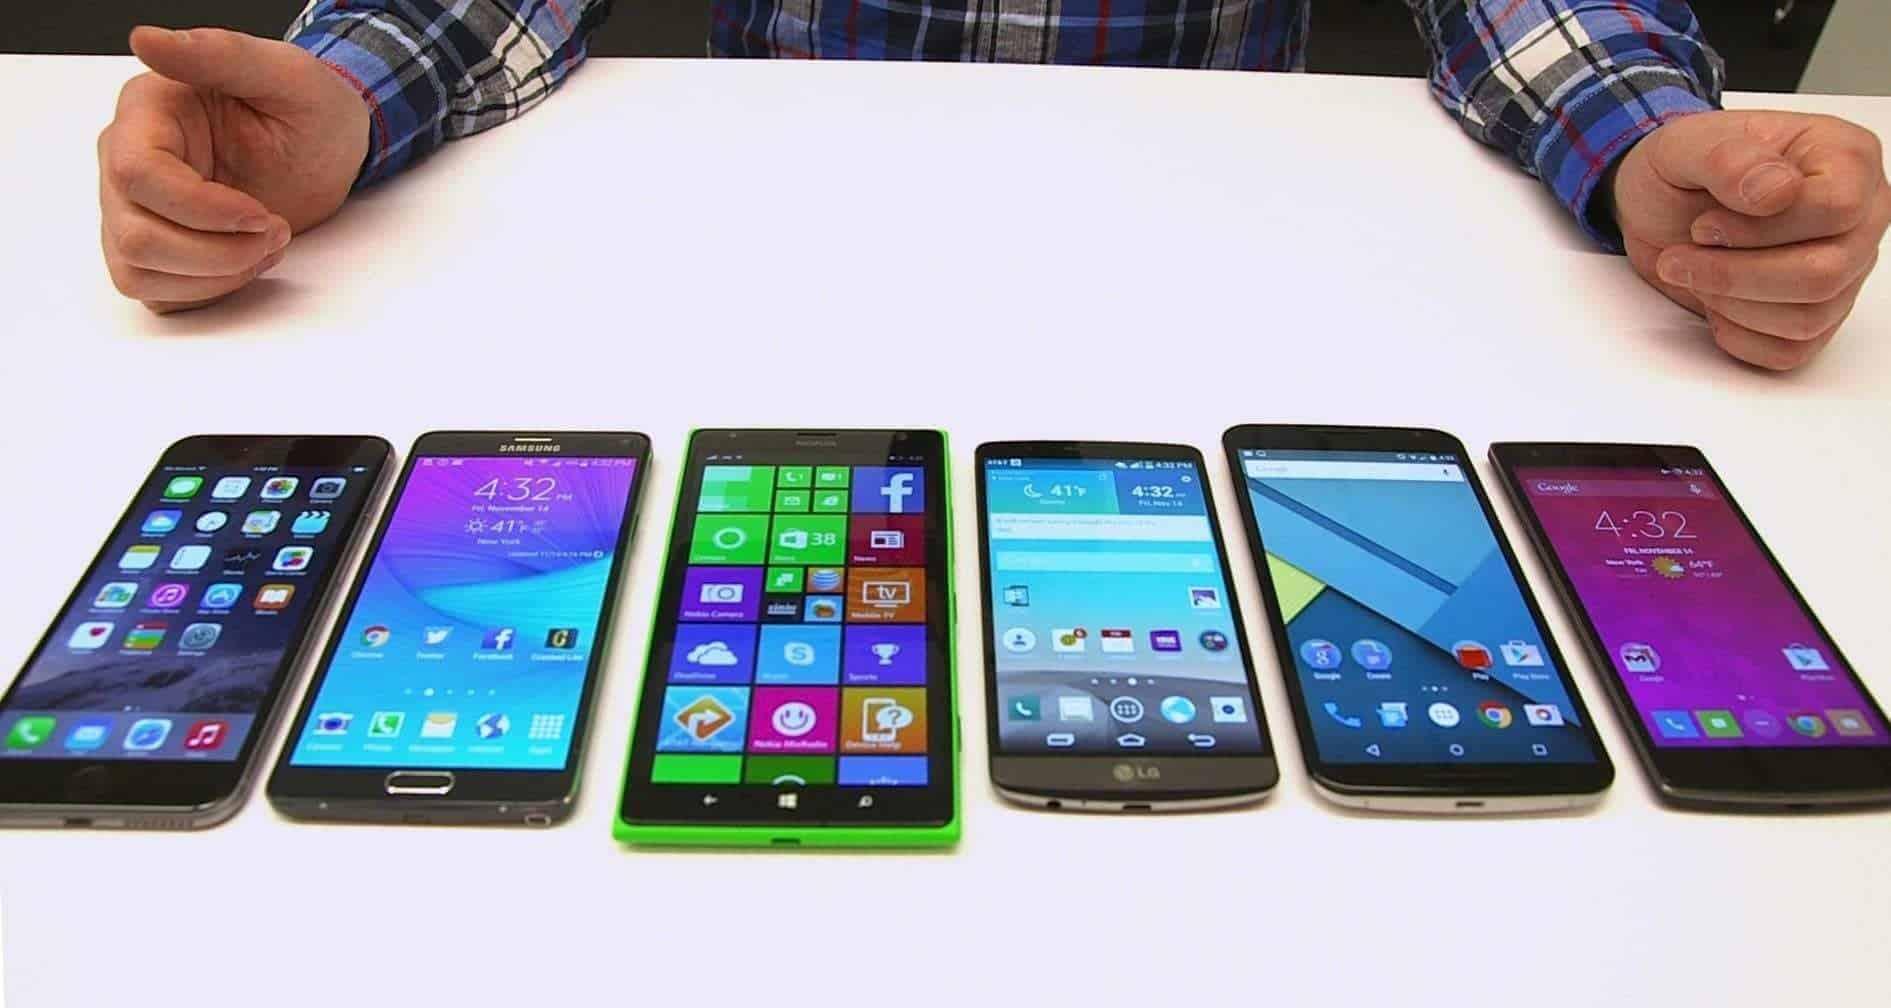 LED screens in mobile phones